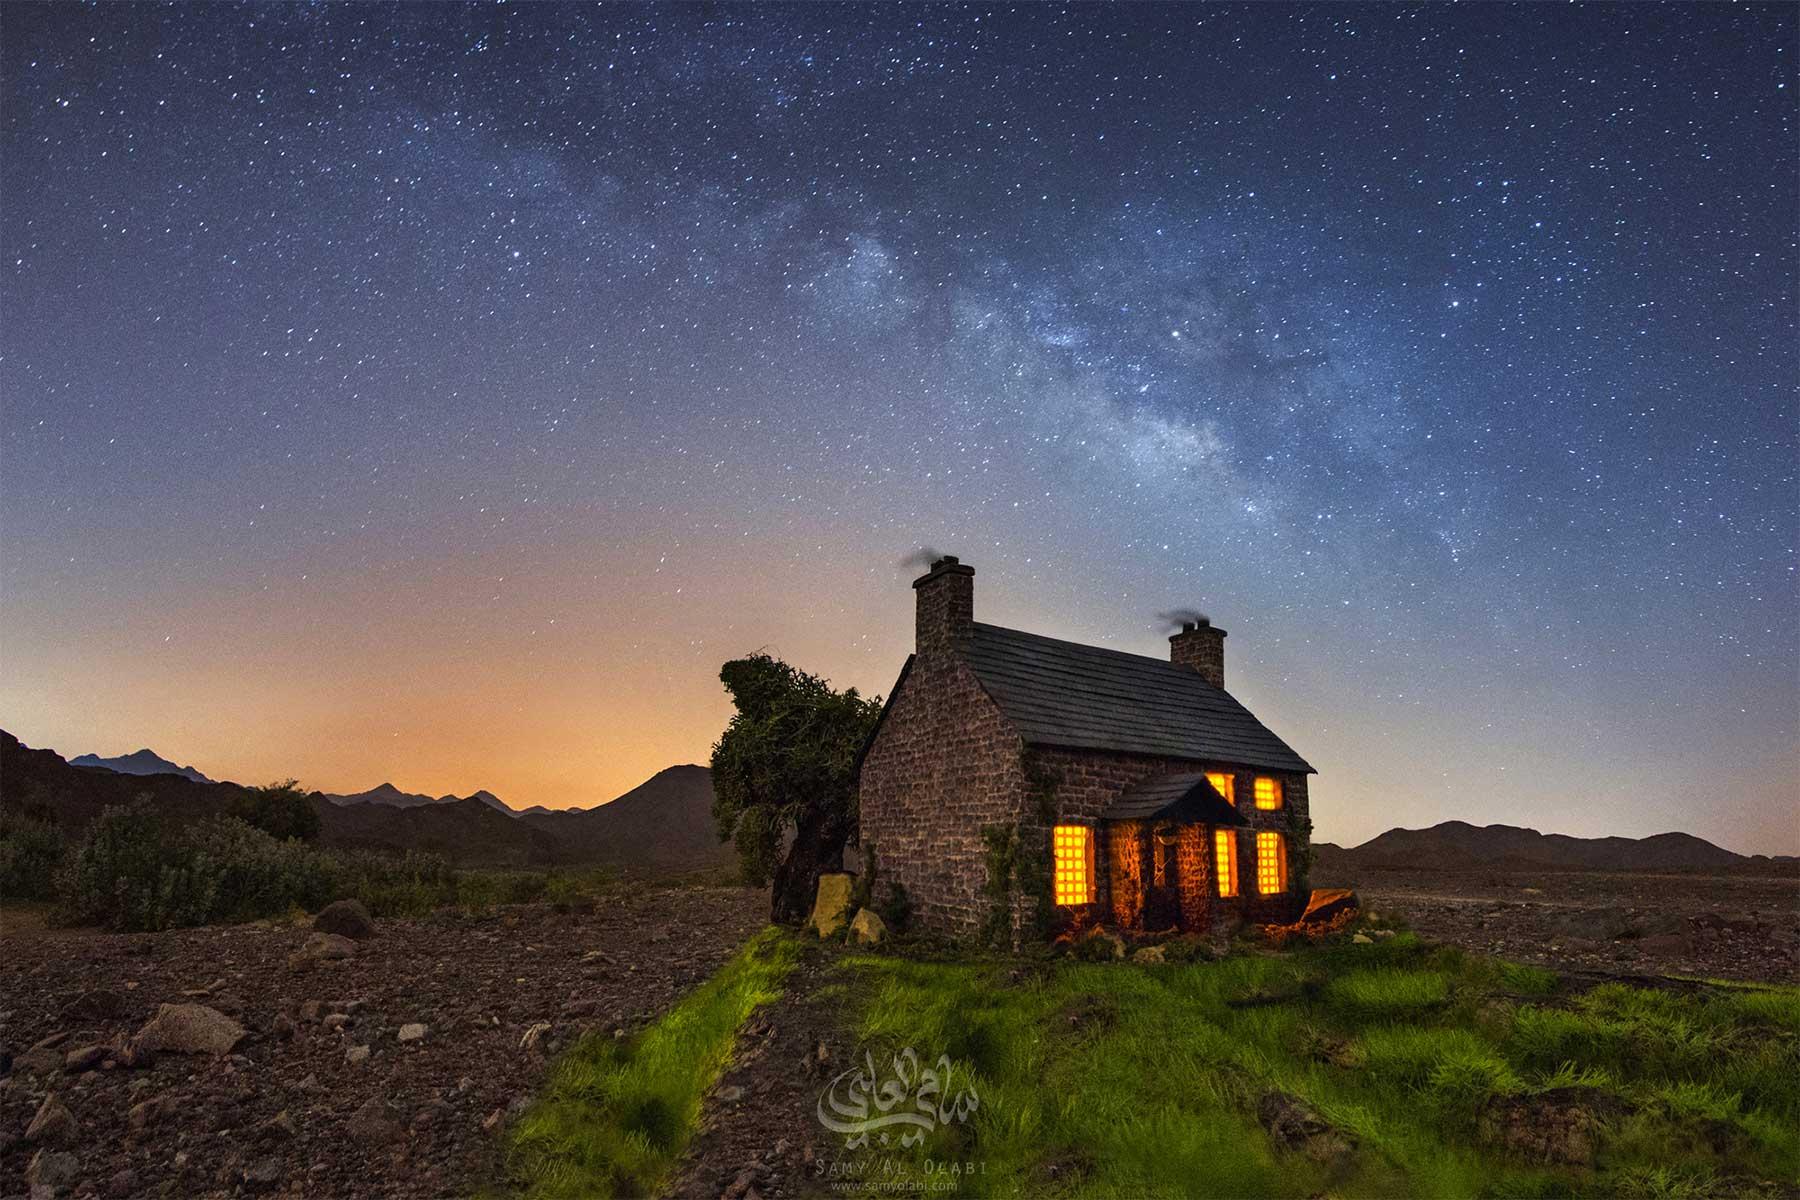 Miniaturhäuser unterm Sternenhimmel abgelichtet miniatur-Samy-Al-Olabi_01